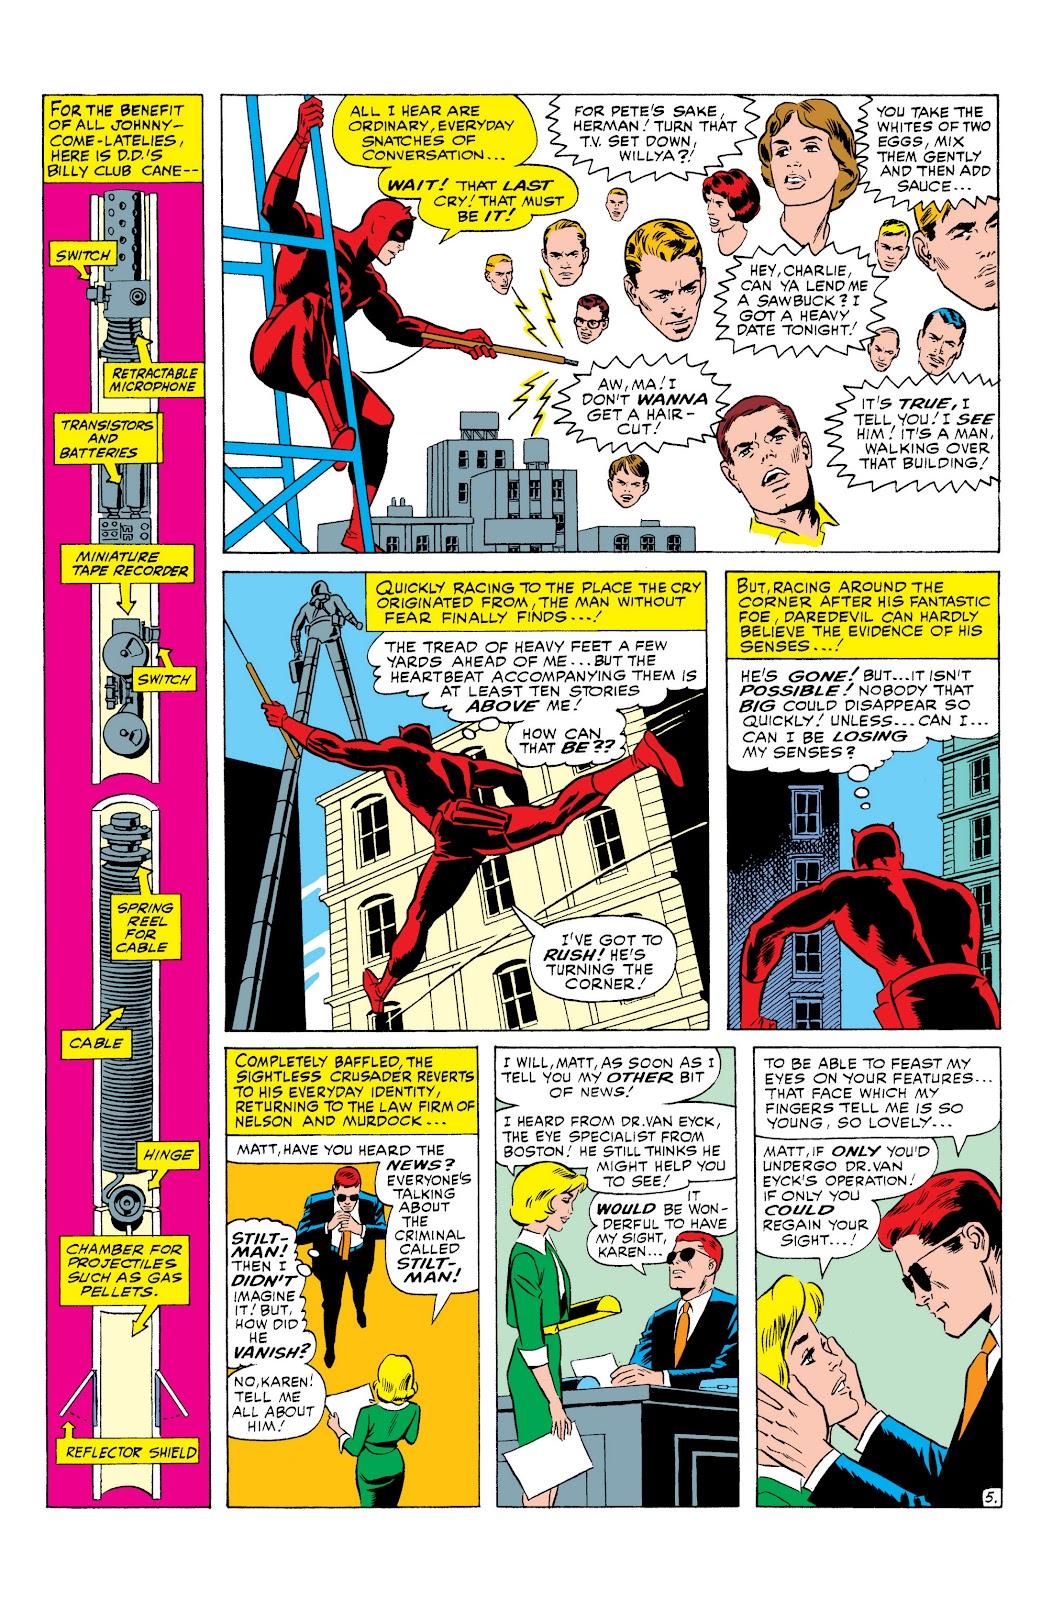 Read online Marvel Masterworks: Daredevil comic - Issue # TPB 1 (Part 2) - 69